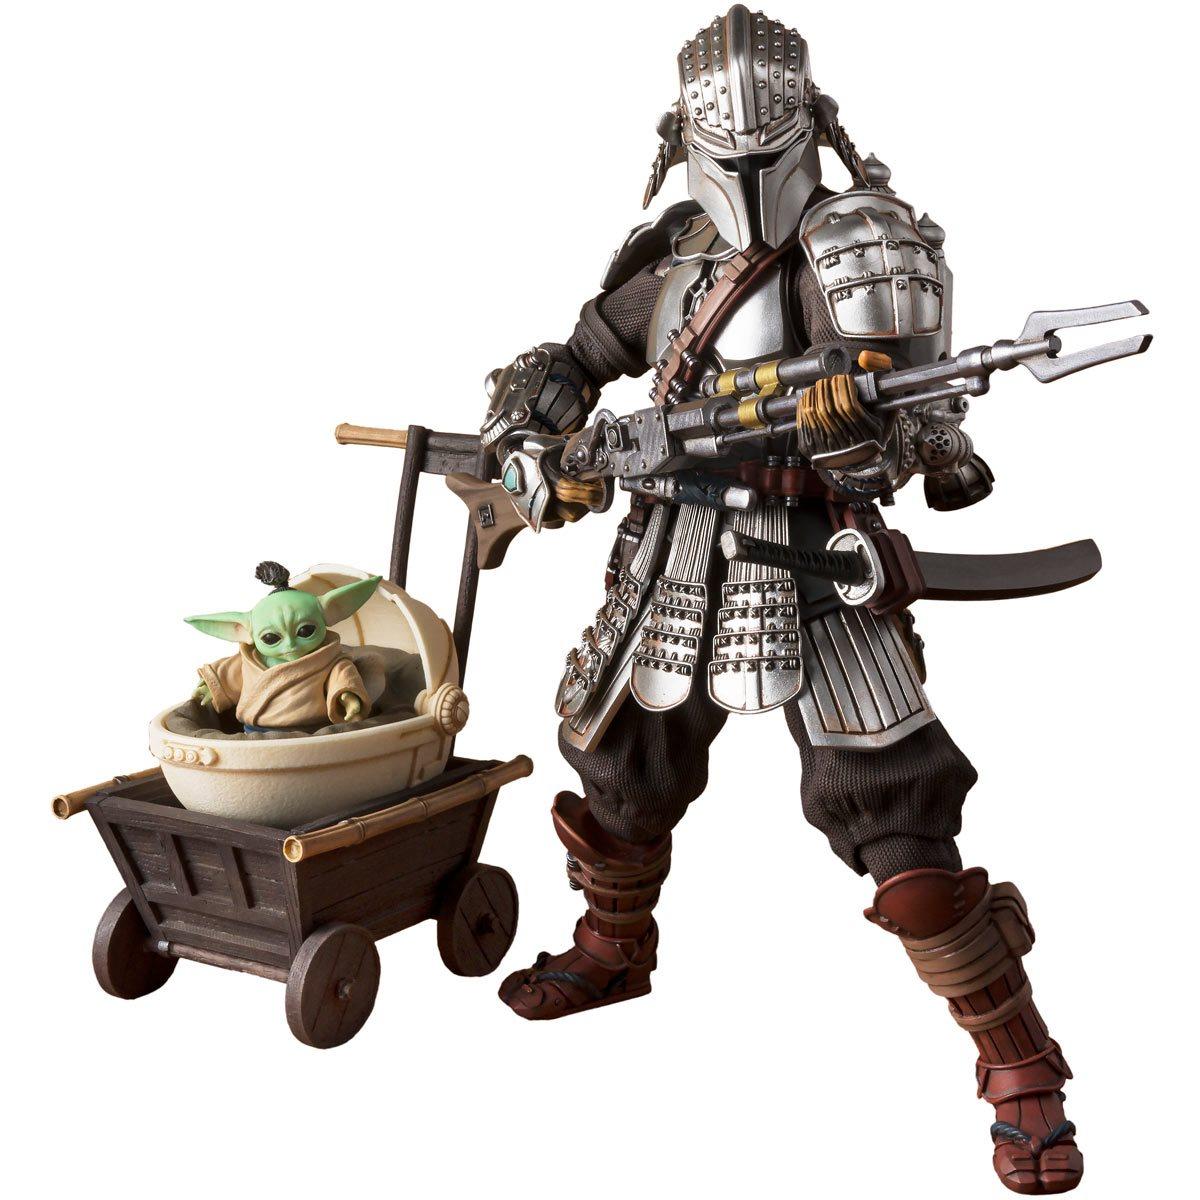 Star Wars Meisho Movie Realization Ronin Mandalorian & Grogu Action Figure画像